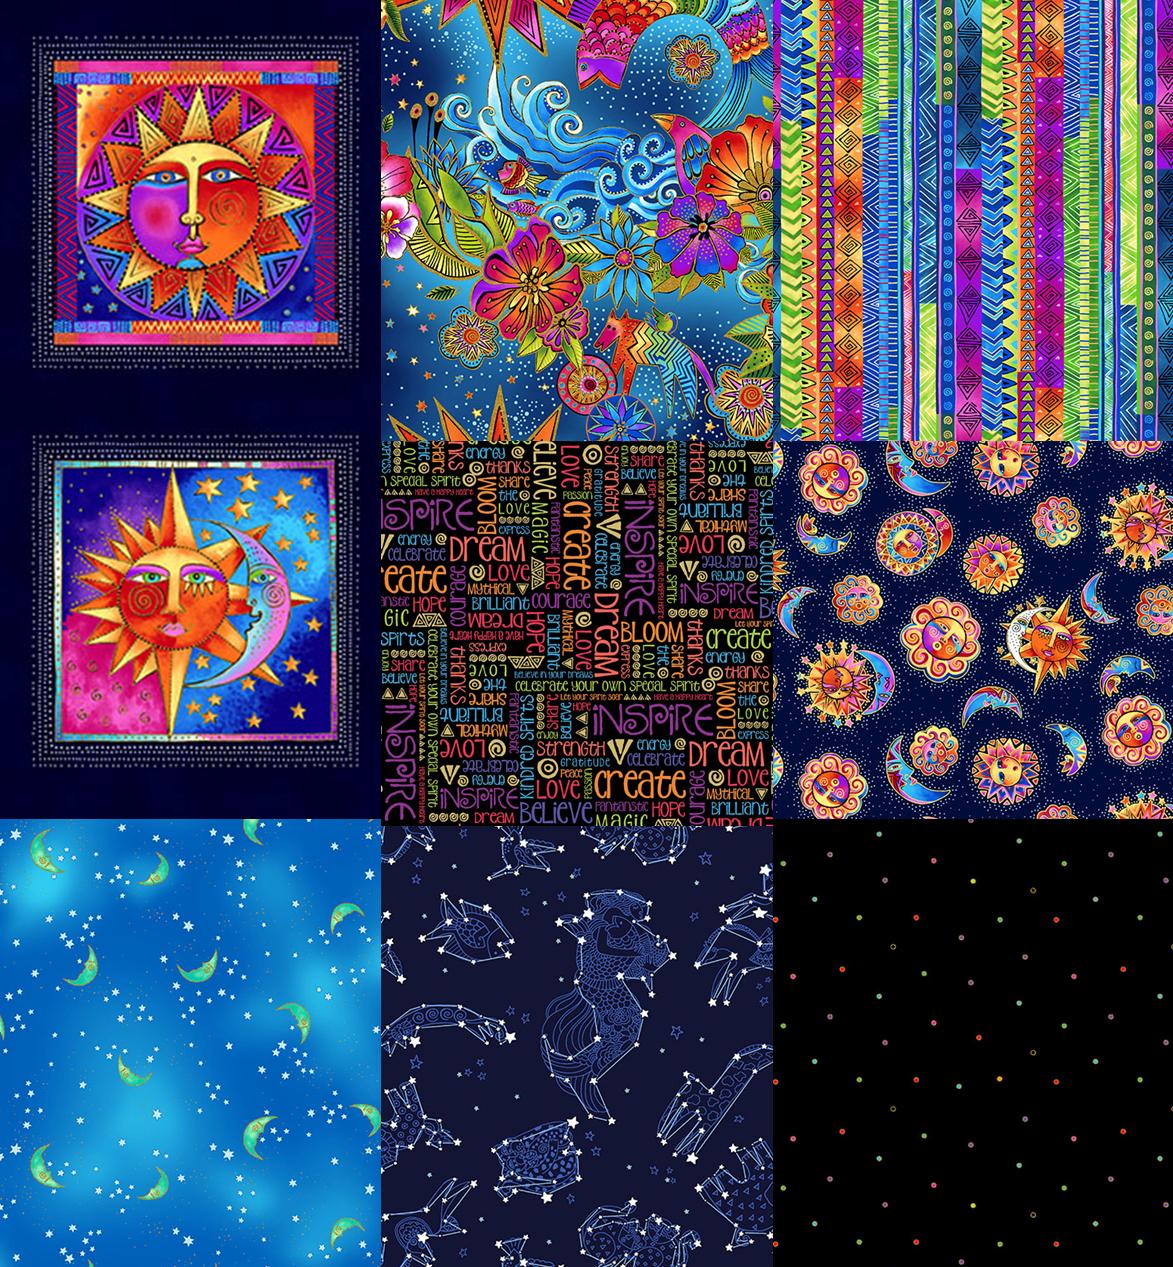 Laurel Burch - Celestial Magic - 1 Panel and 7 Fat Quarters